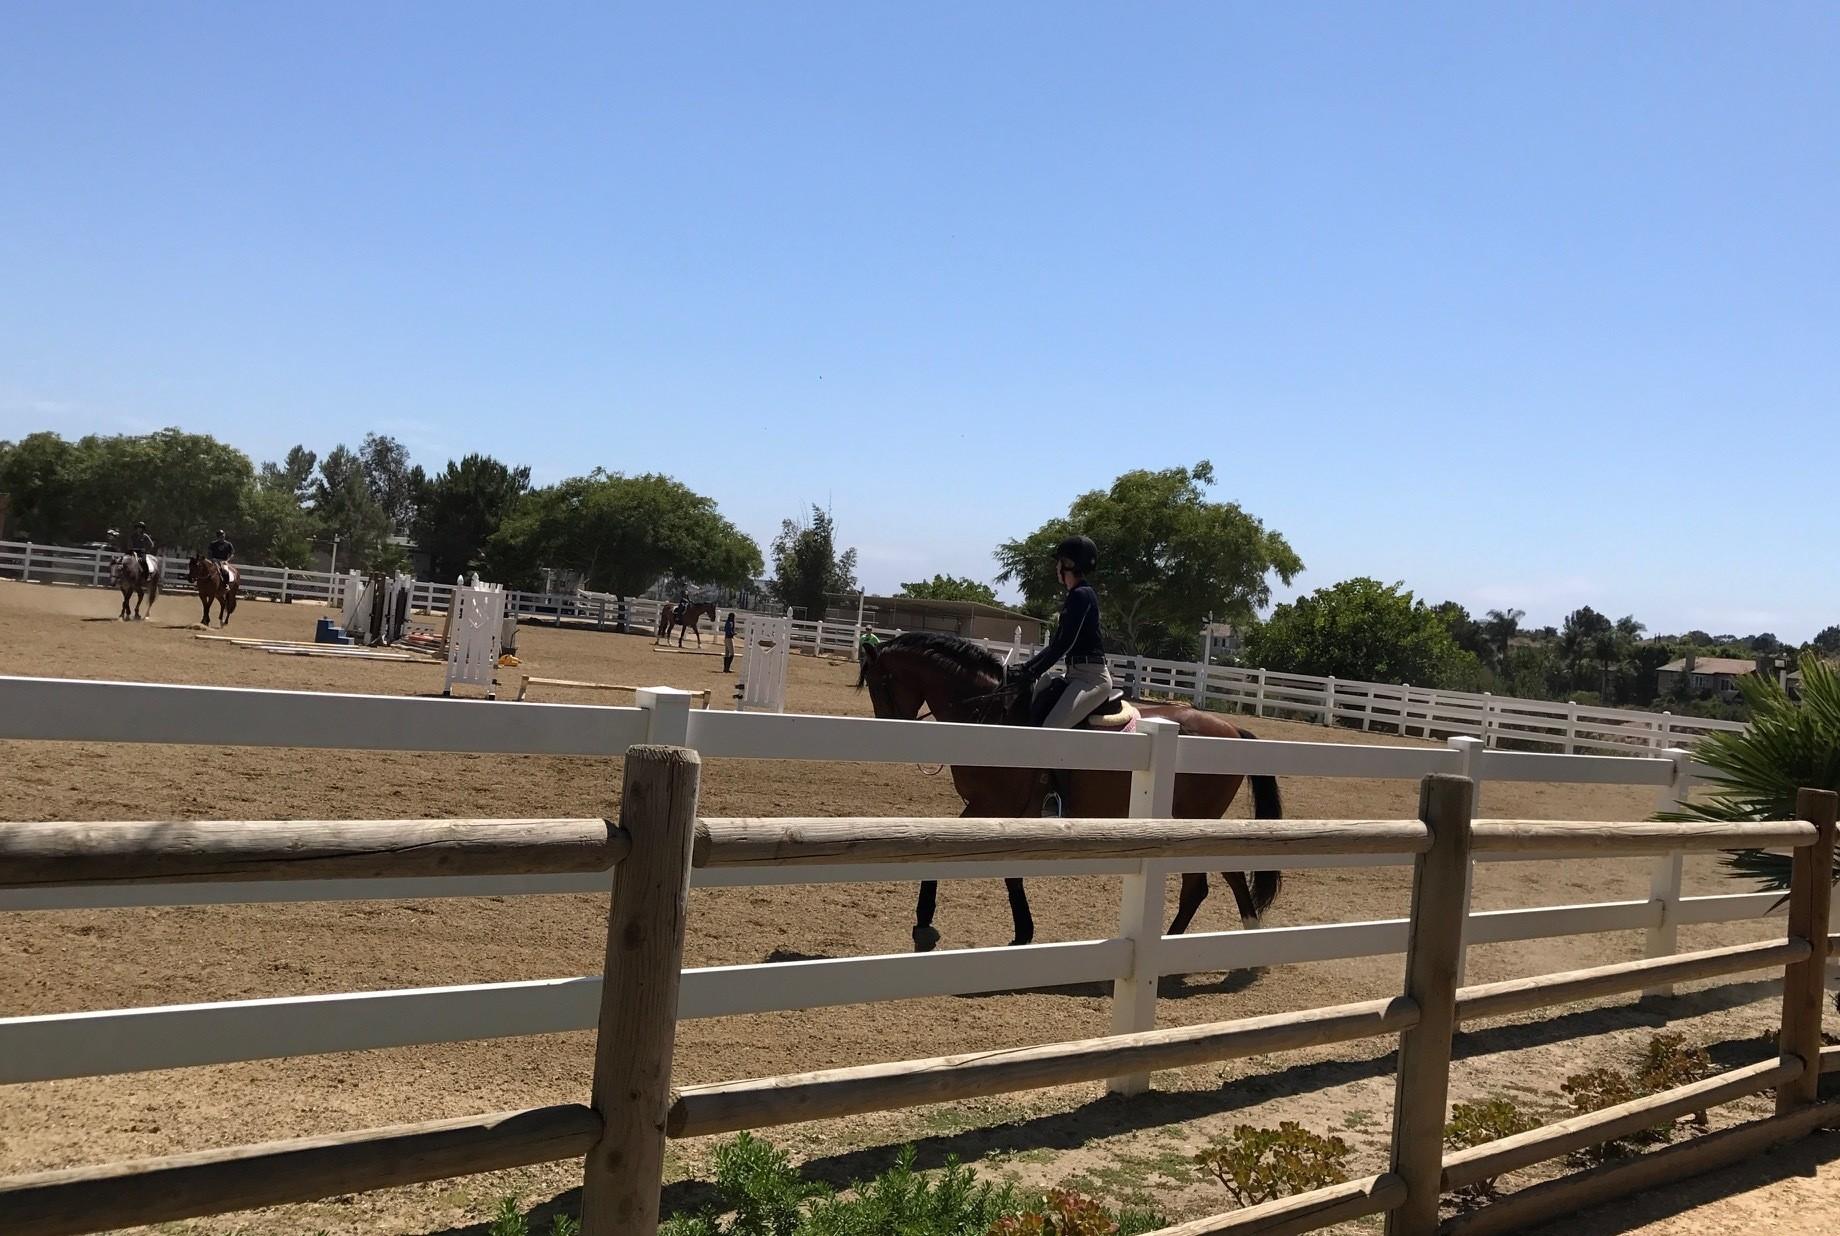 Equestrian Center To Transition To Senior Care Facility